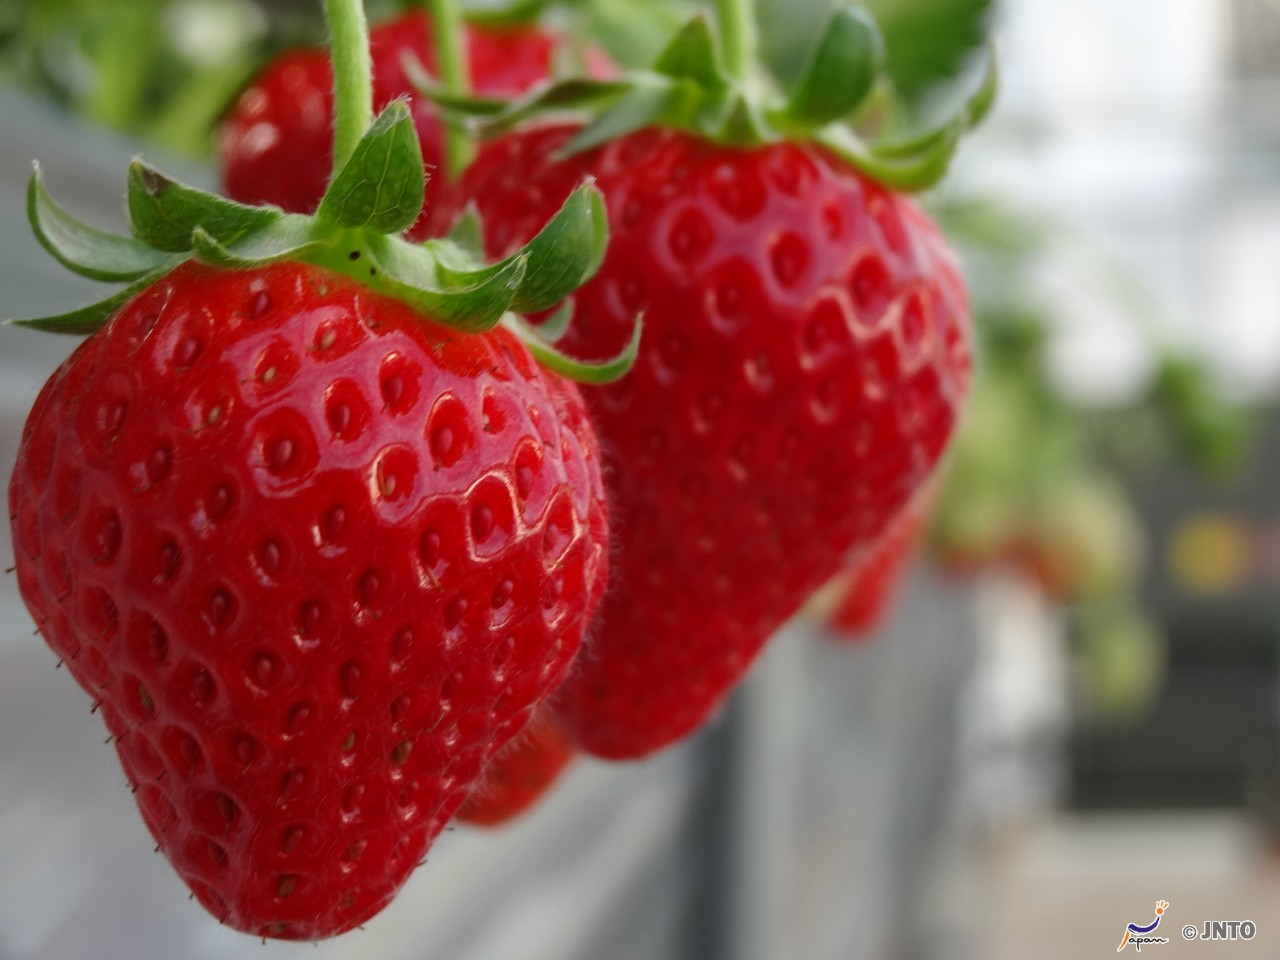 (1) Fuji's Best Cherry Blossom Spots Tour plus All-you-can-eat Strawberry Picking   (2) Fuji Shibazakura & Tulip Flower Festival plus All-you-can-eat Strawberry Picking